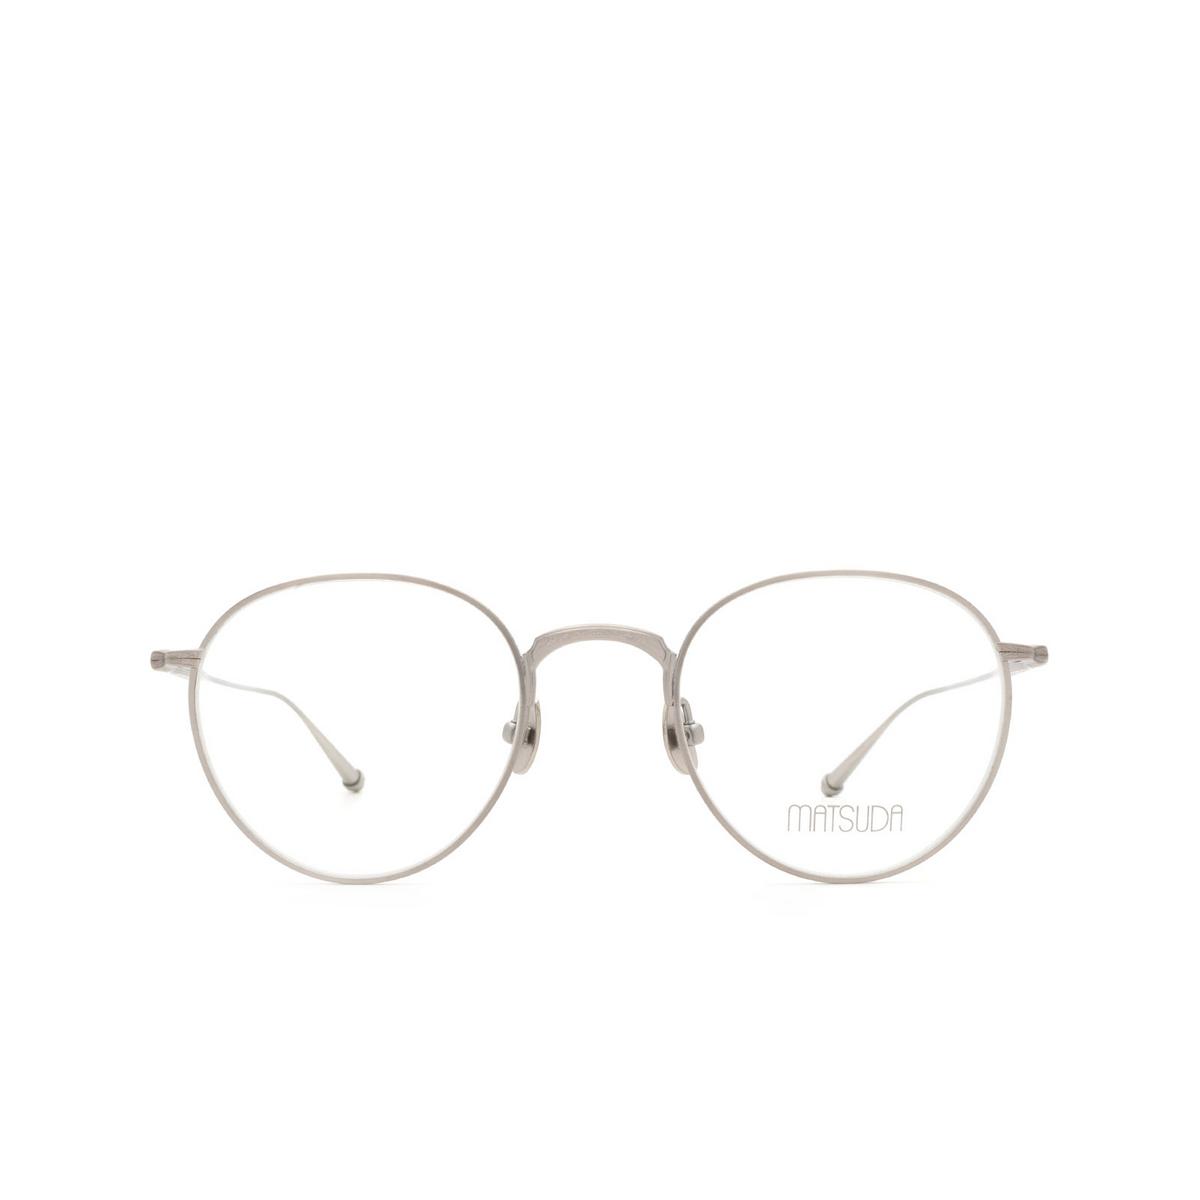 Matsuda® Round Eyeglasses: M3085 color Antique Silver As.